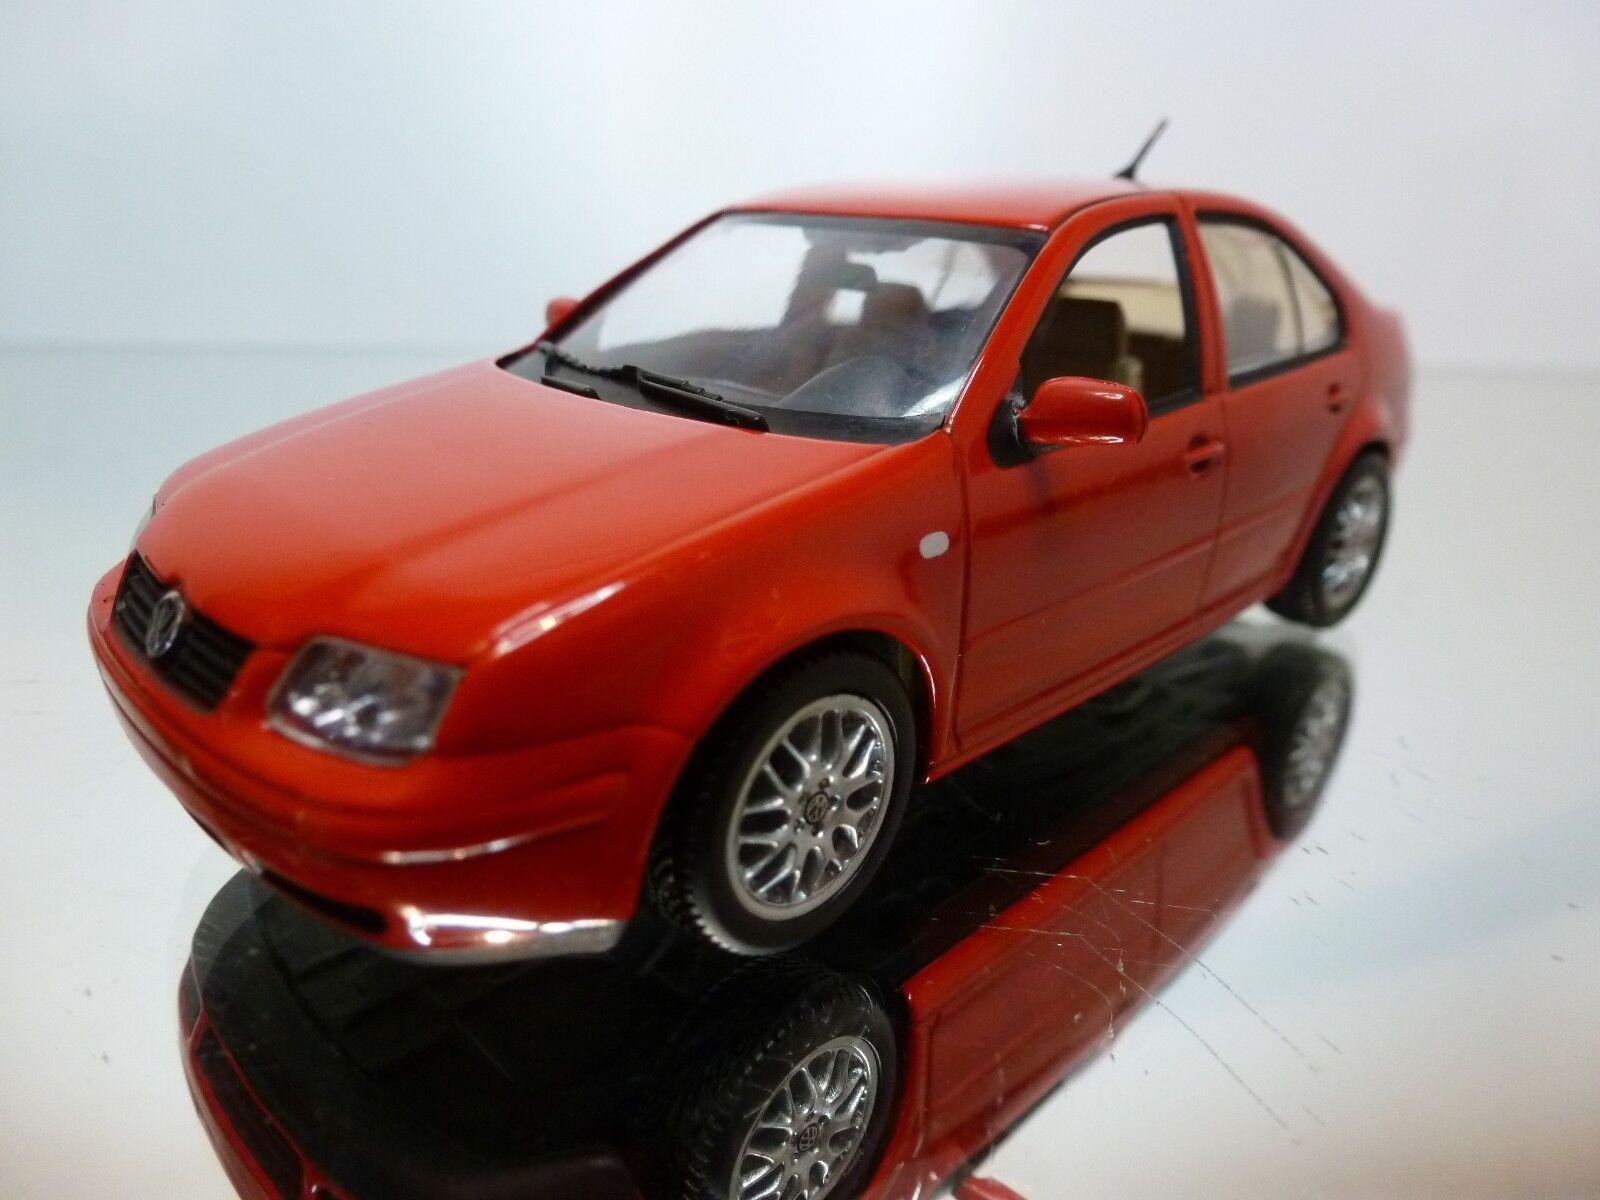 MINICHAMPS VW VOLKSWAGEN BORA - rouge 1 43 - EXCELLENT CONDITION - 13 9